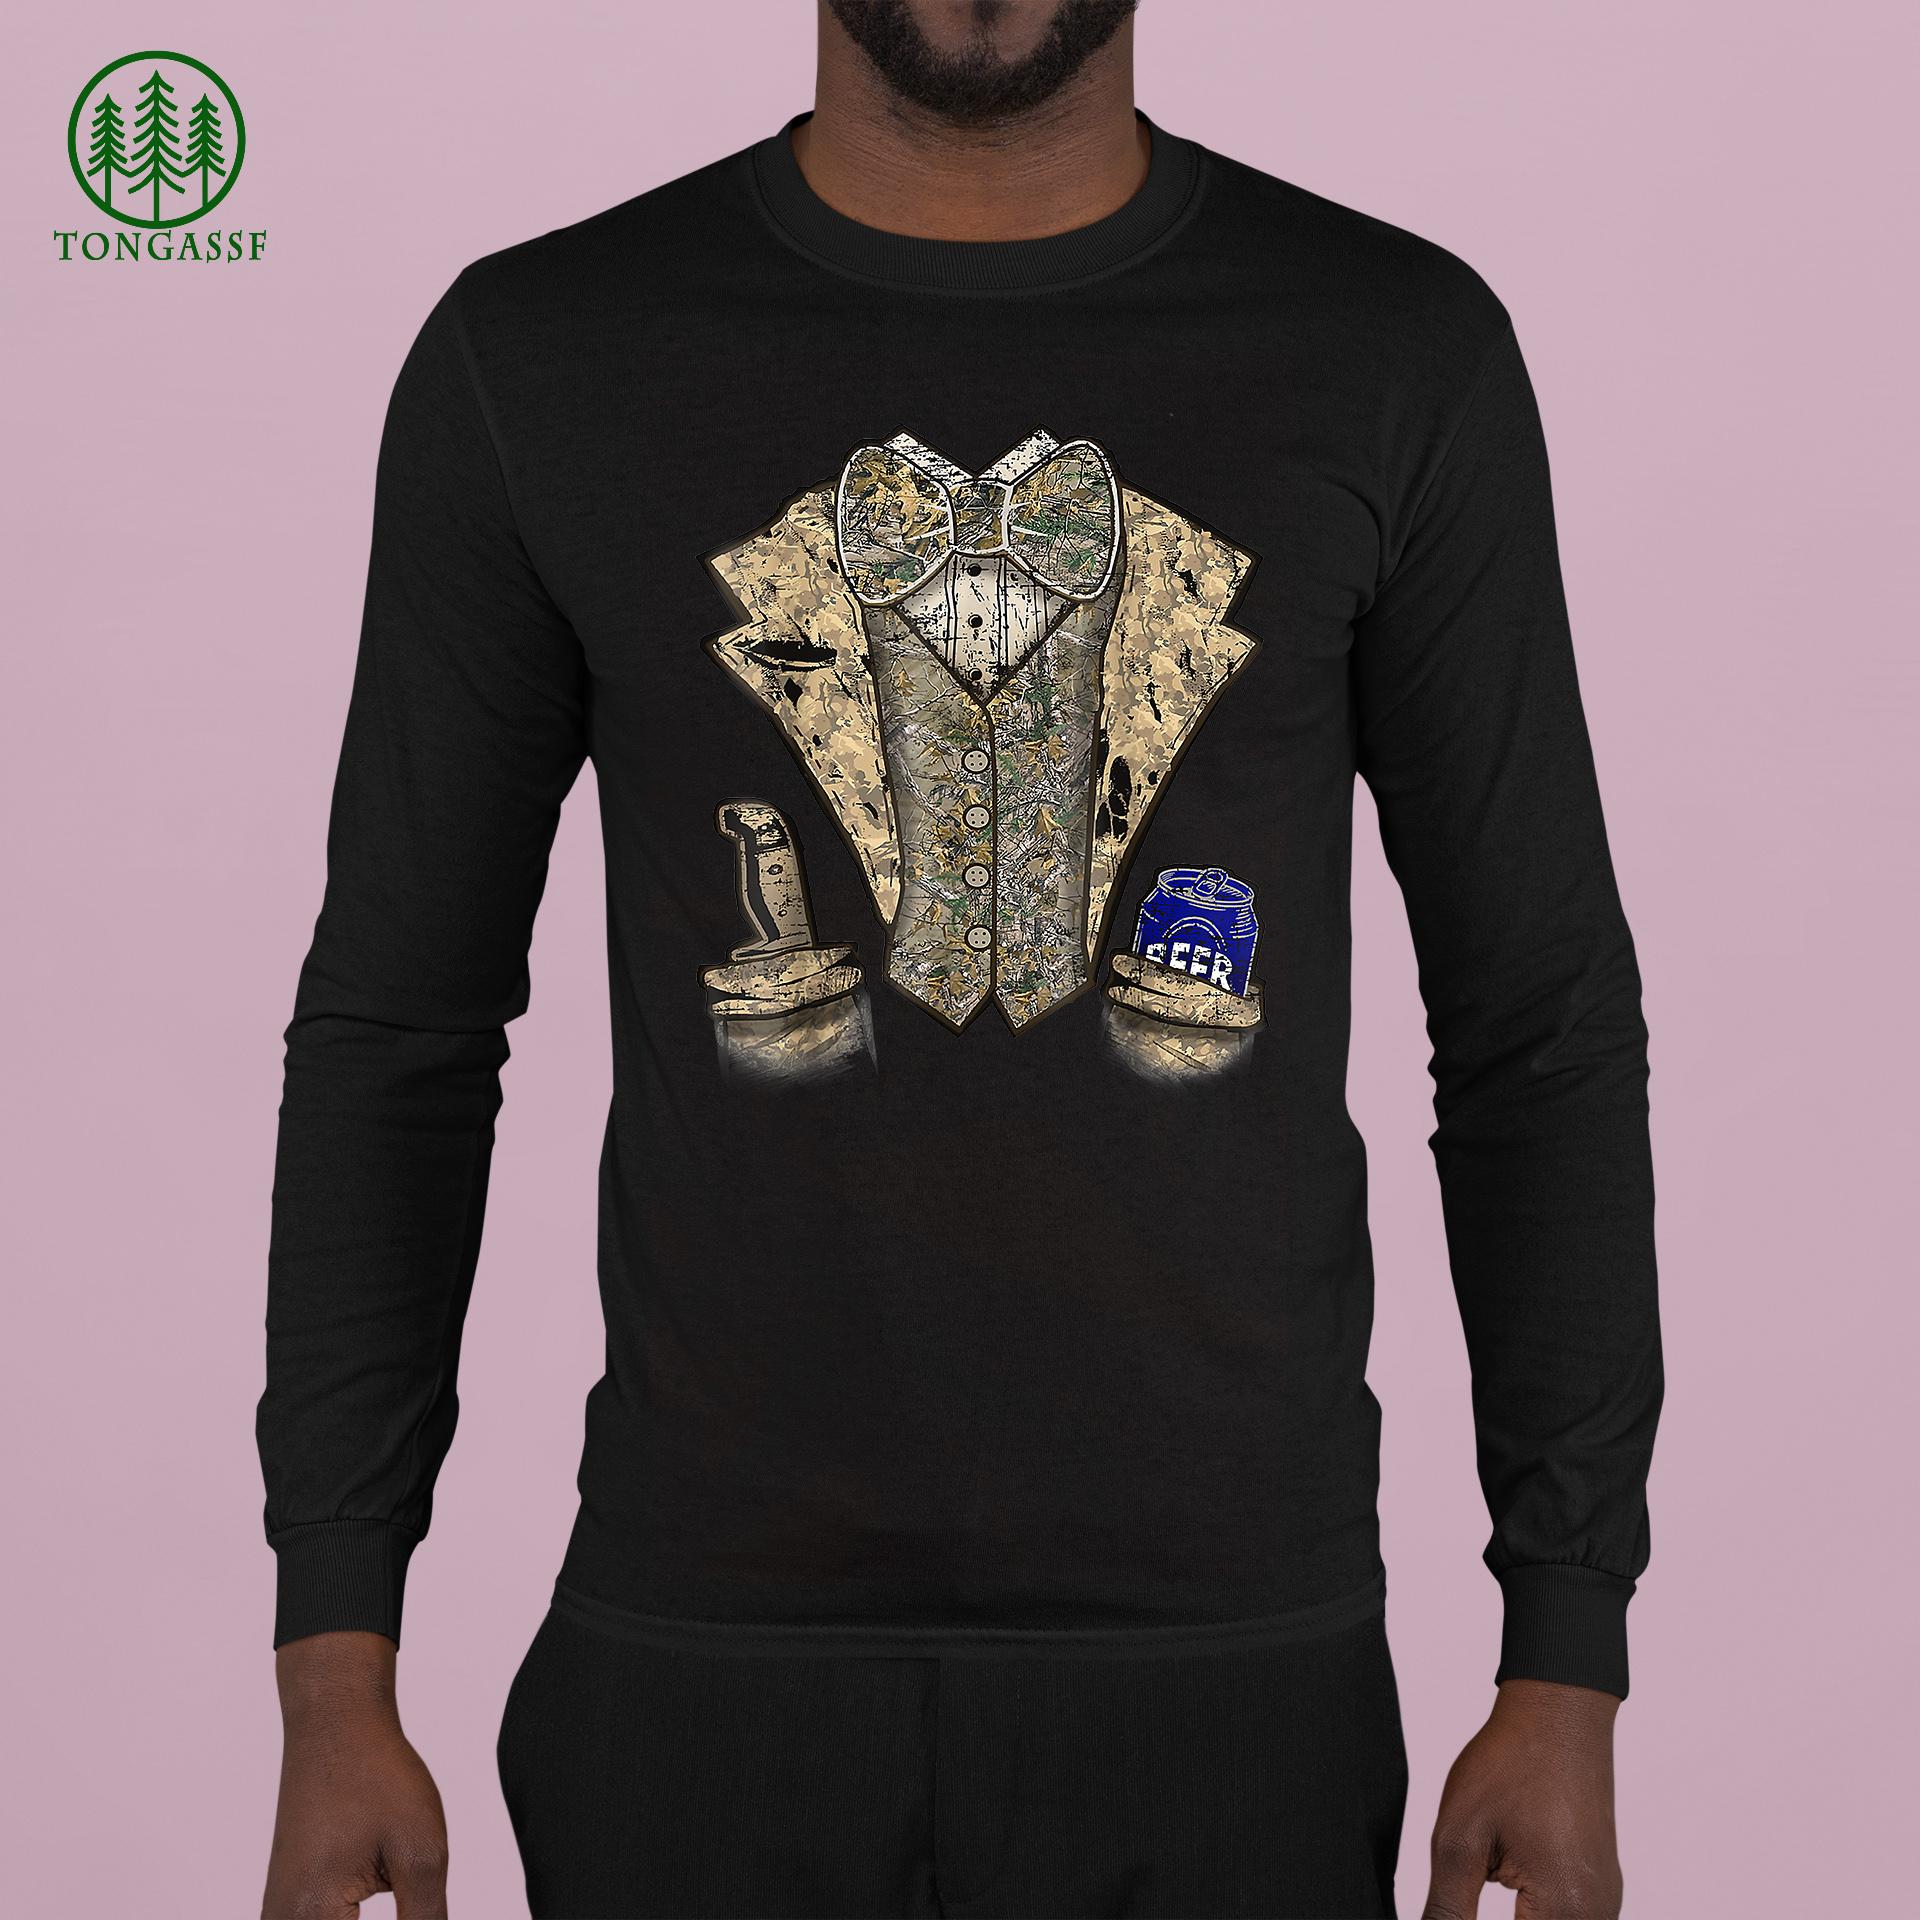 Camo Tuxedo with Bowtie Beer Longsleeve Shirt